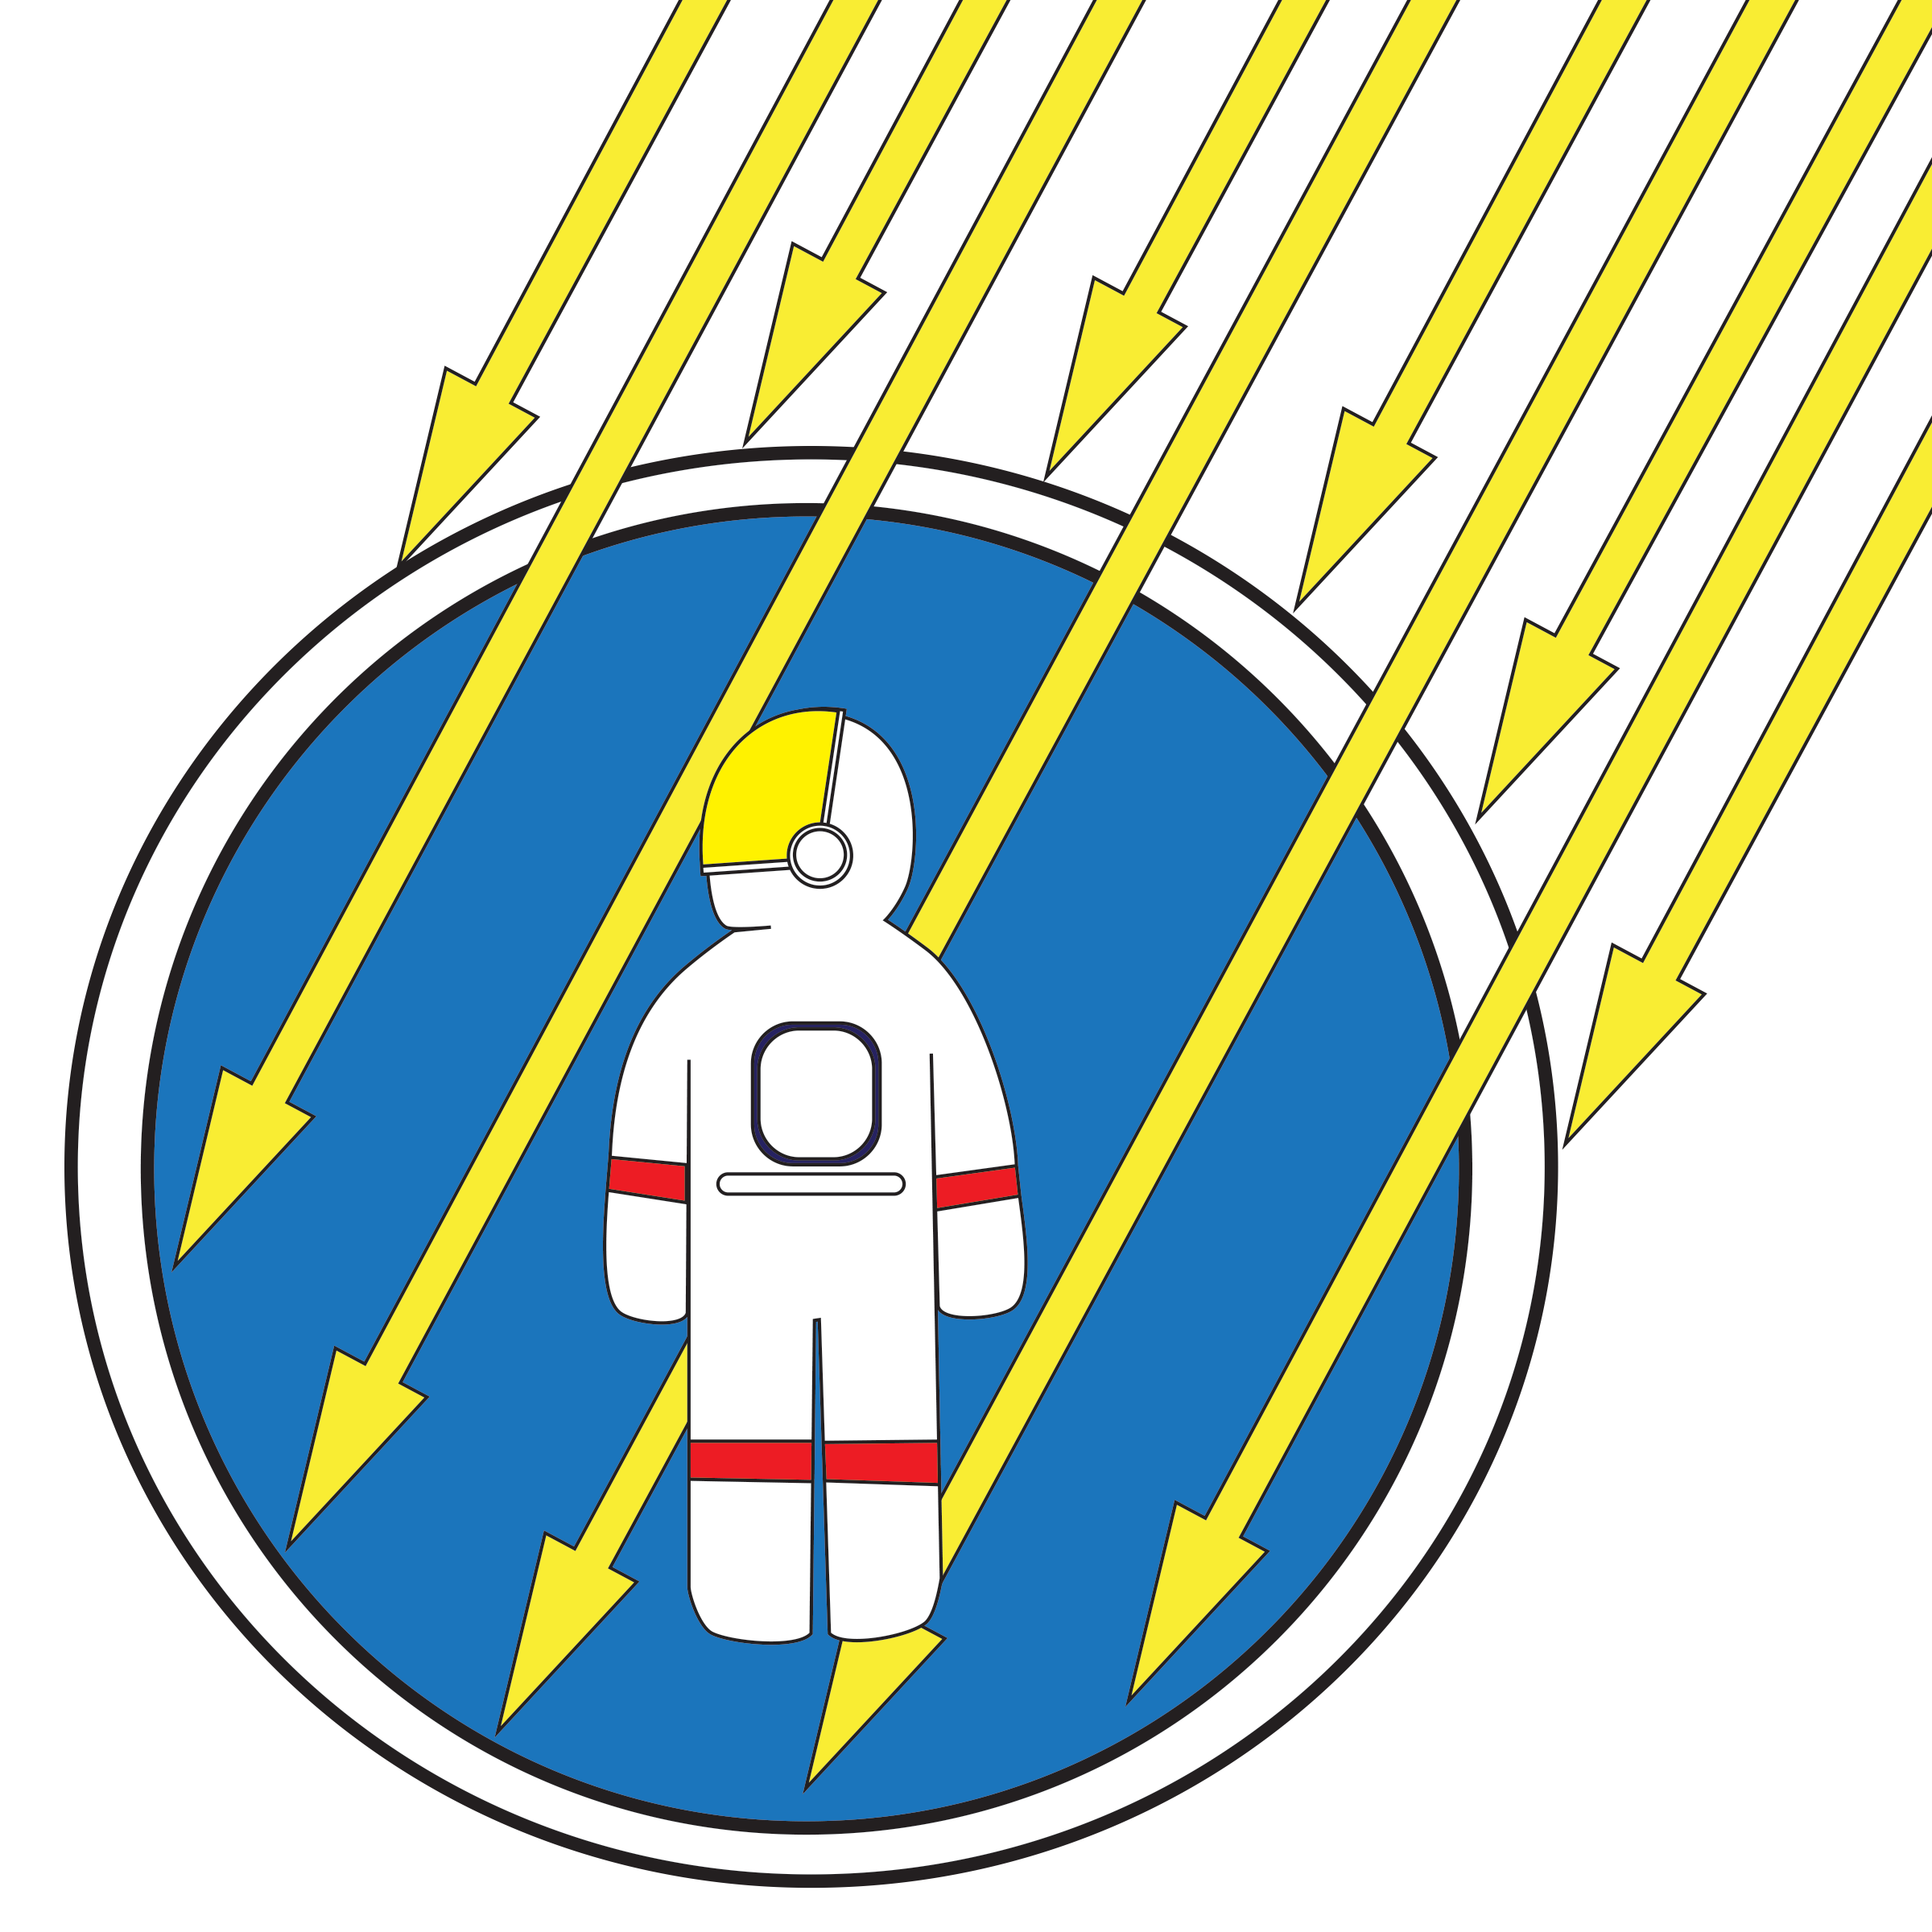 astronaut space radiation - photo #44